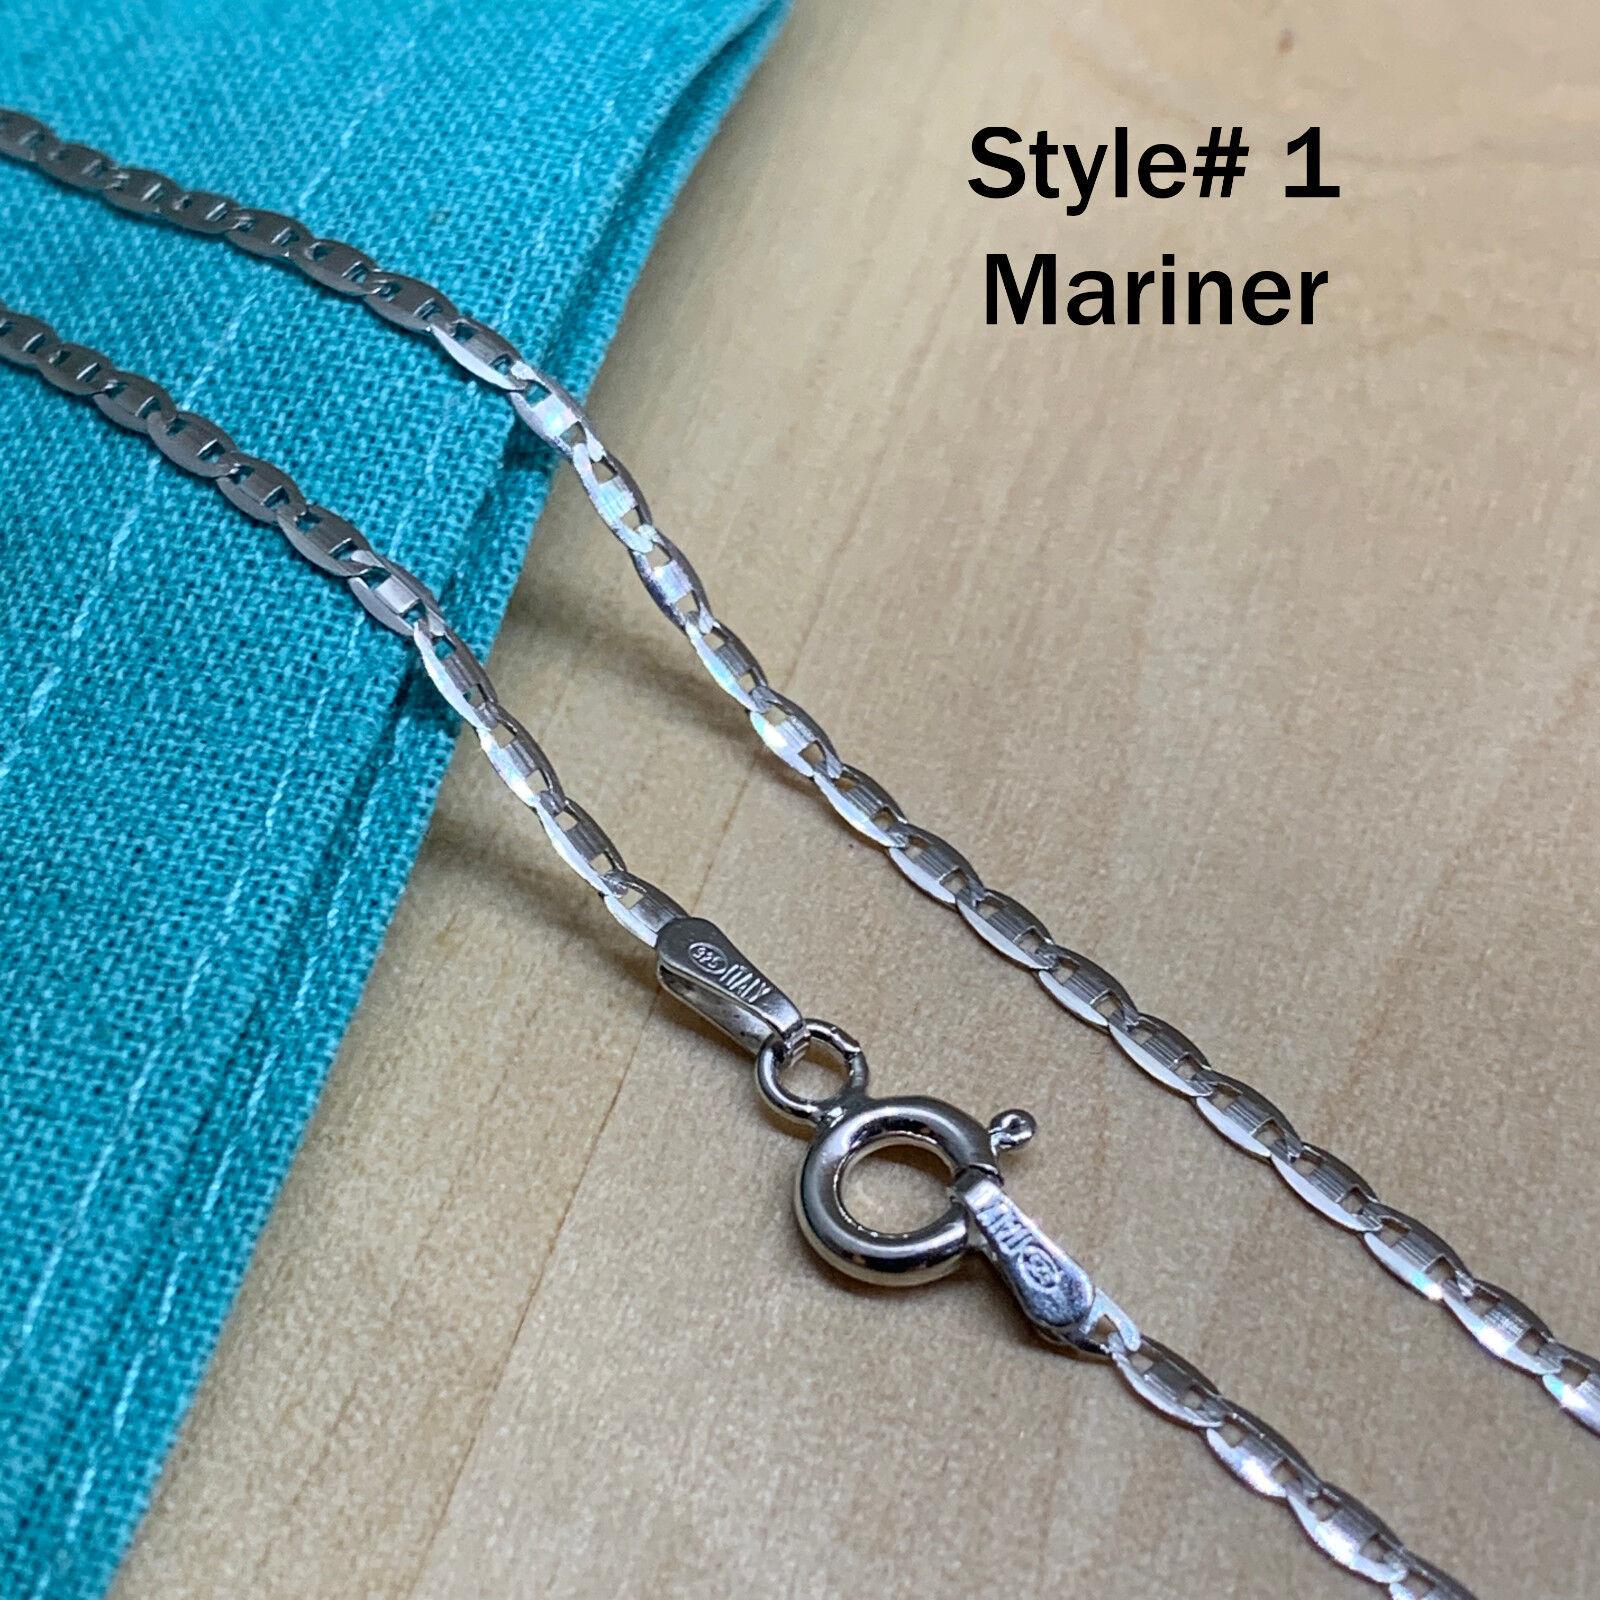 1 - Mariner